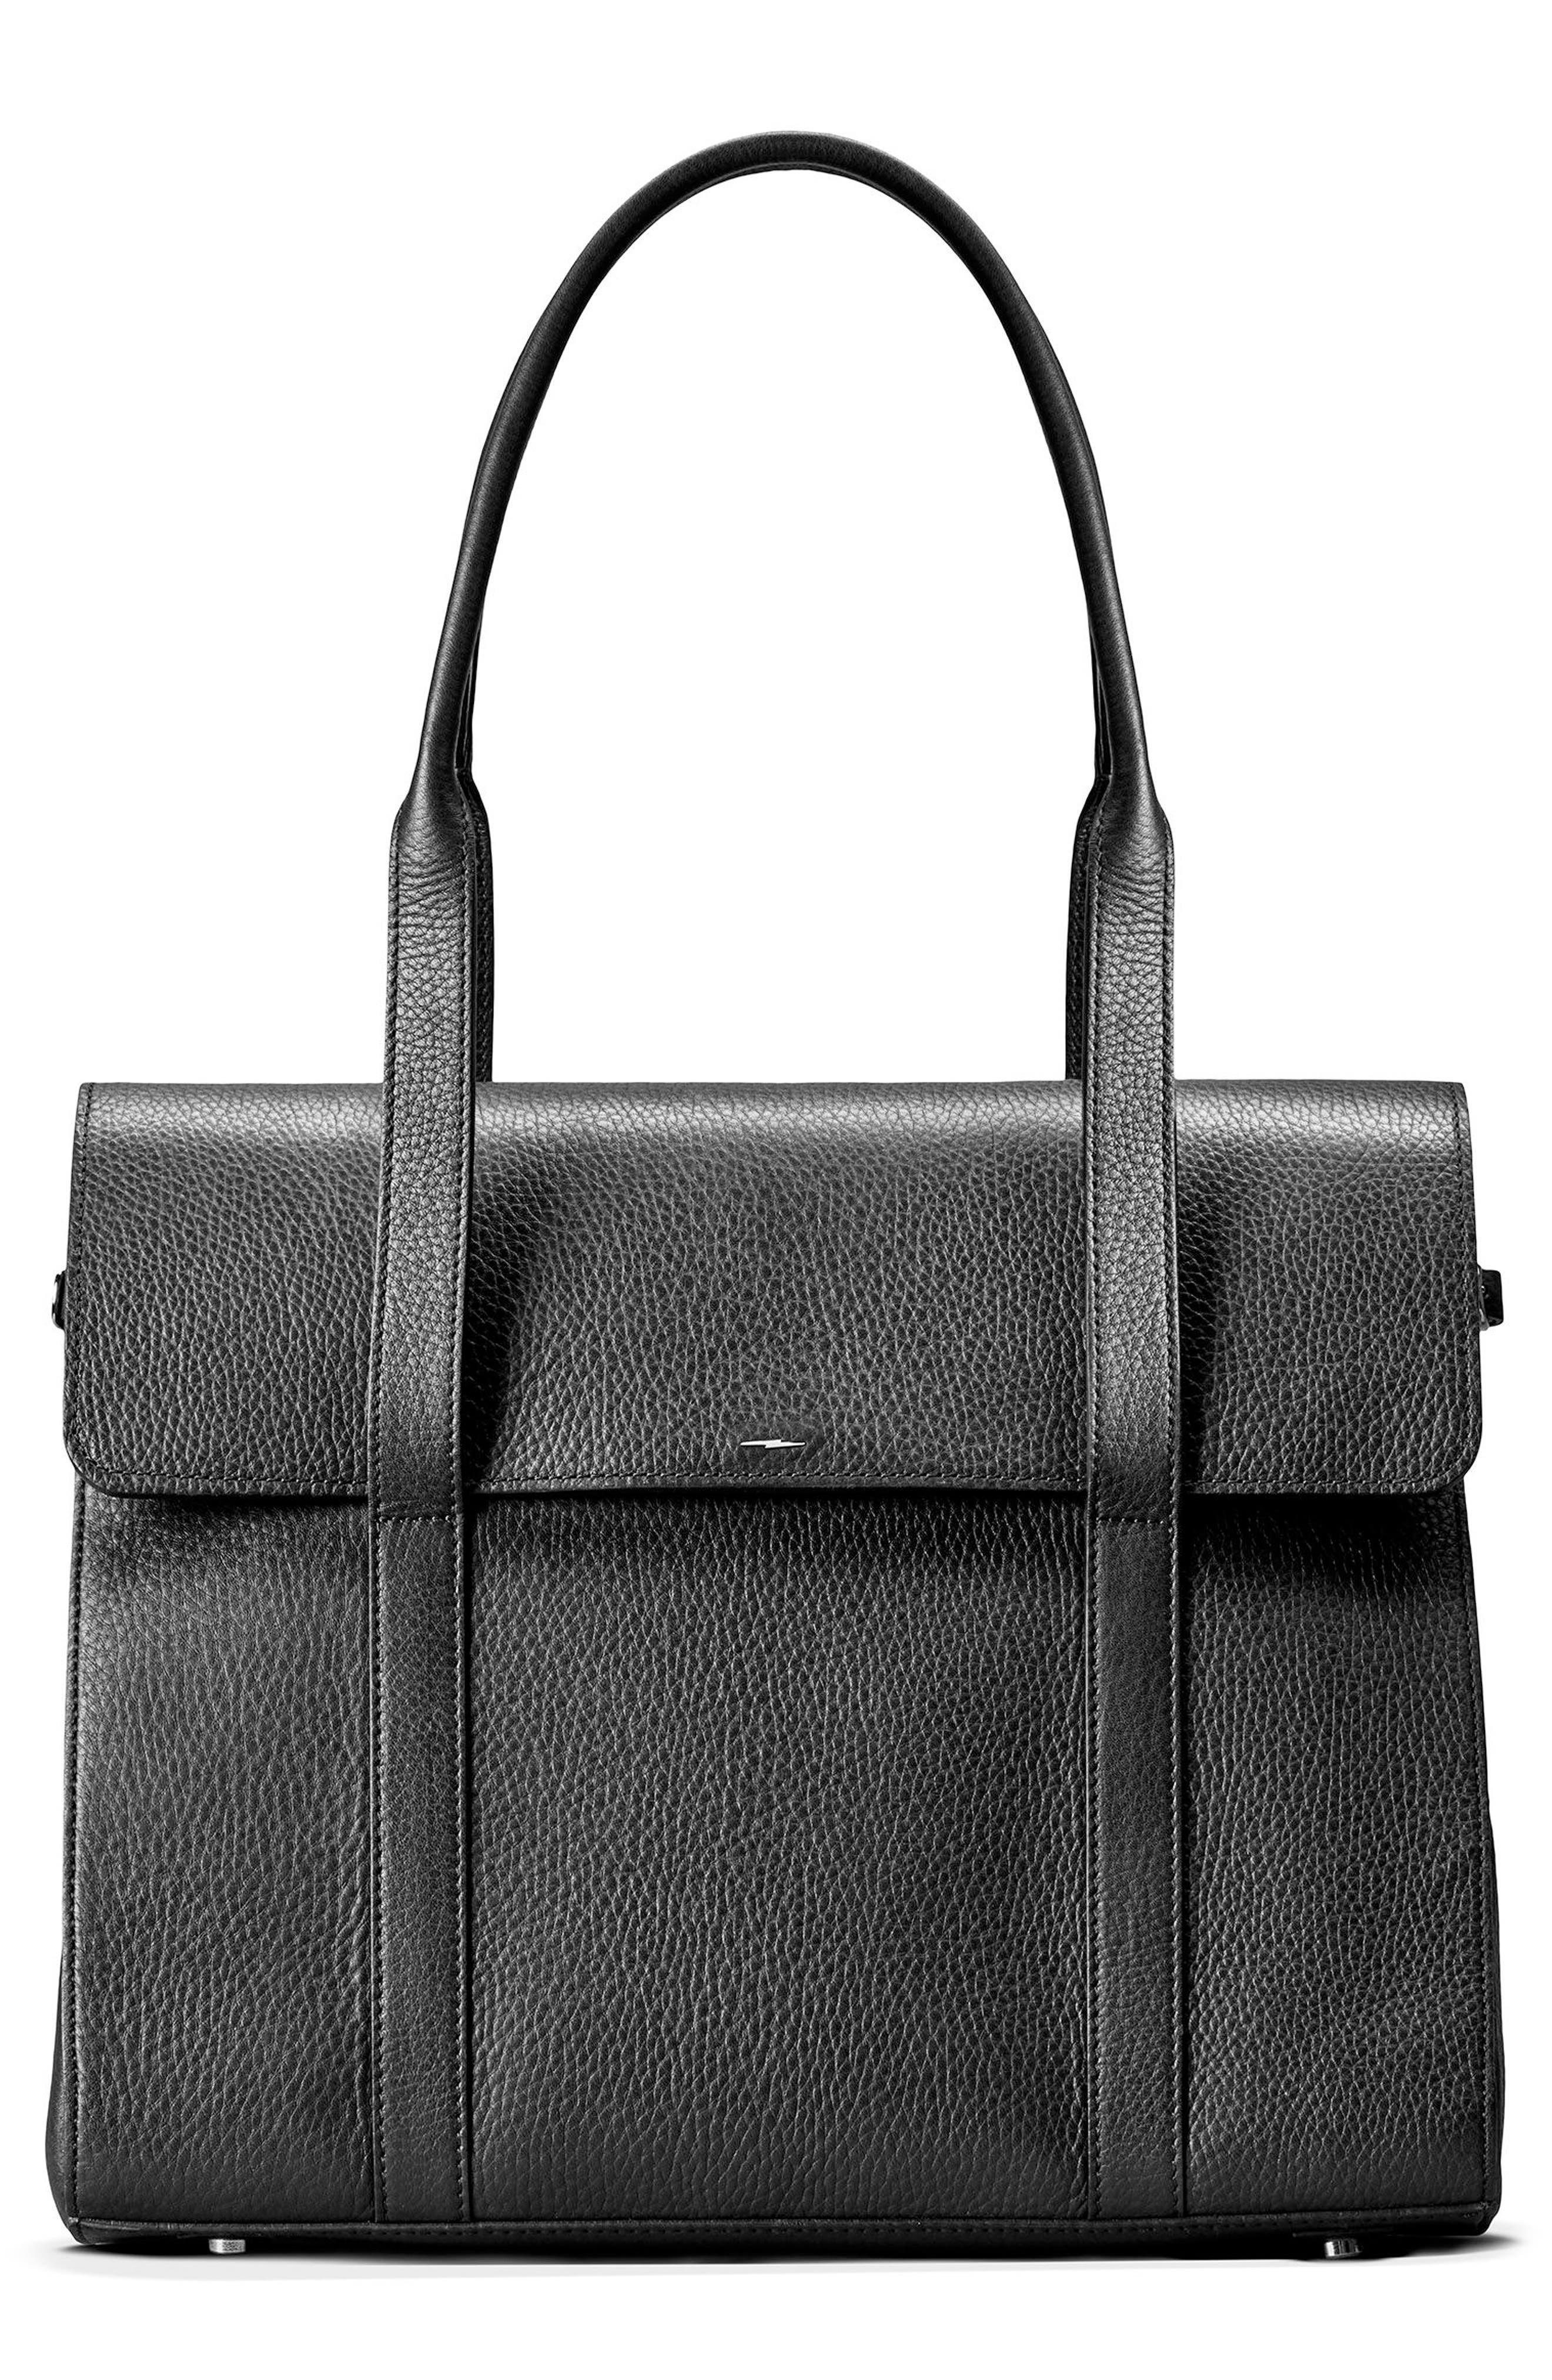 Shinola Calfskin Leather Satchel